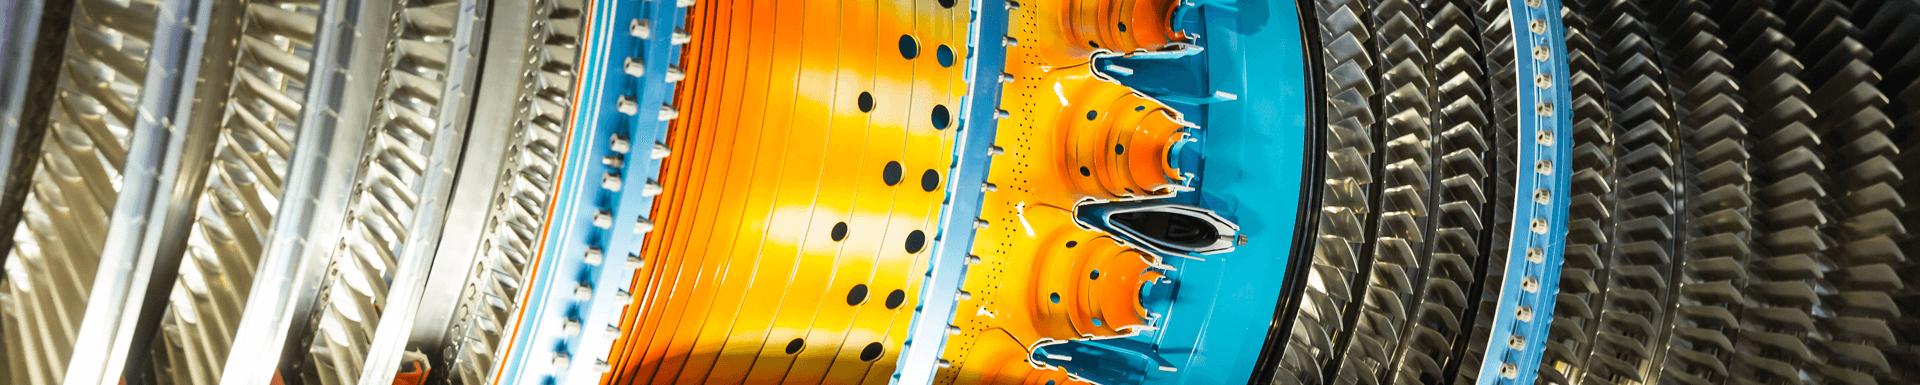 meyer industrial gas turbine